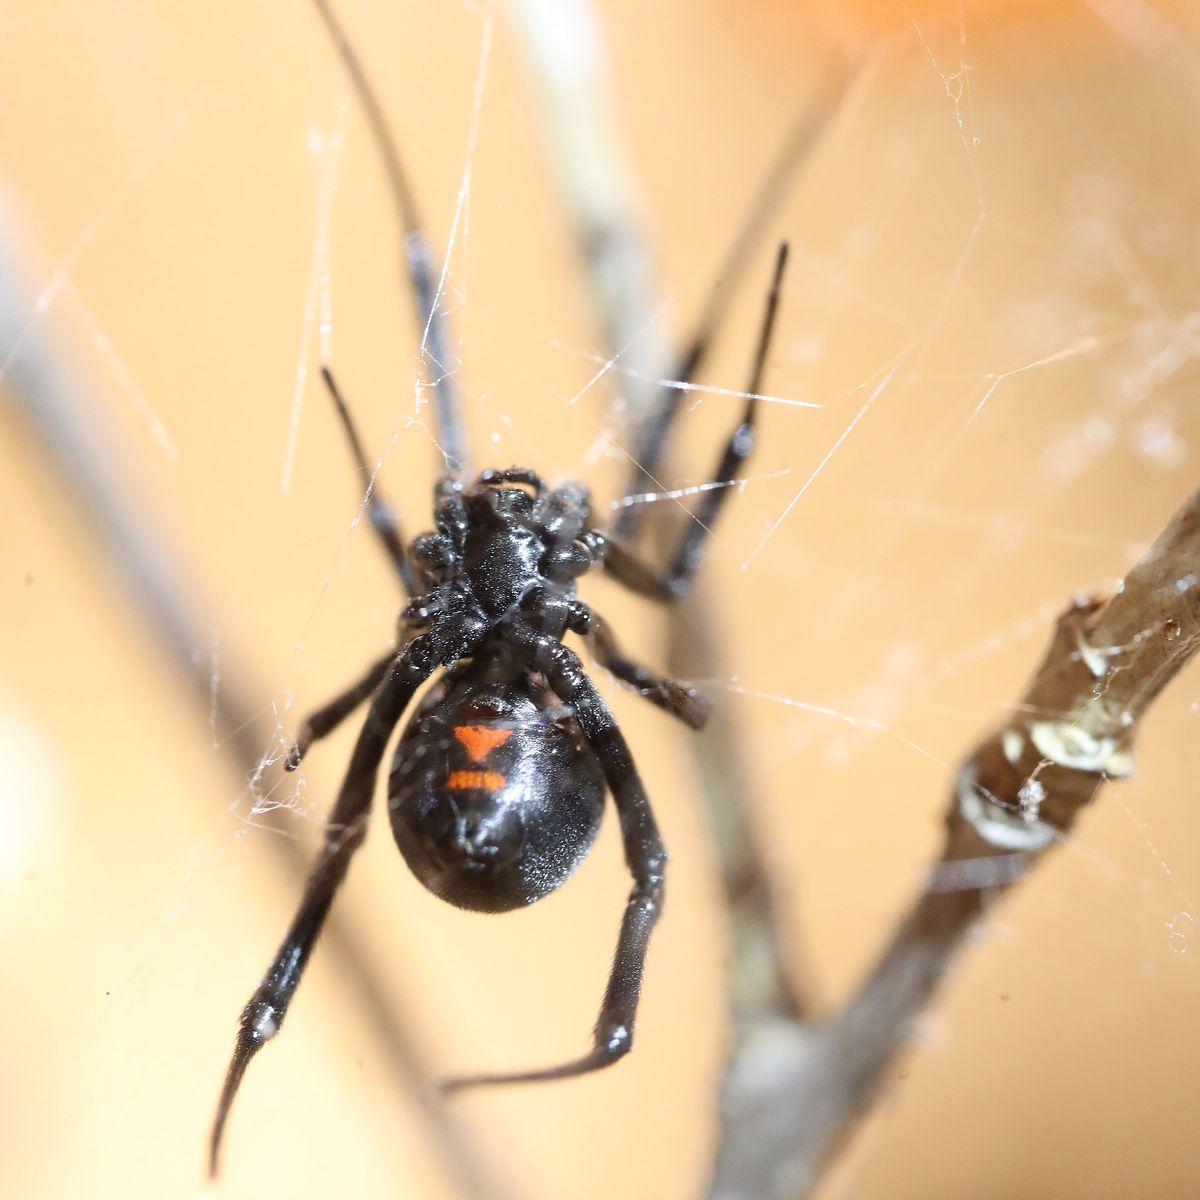 James Wan Is Producing an 'Arachnophobia' Remake